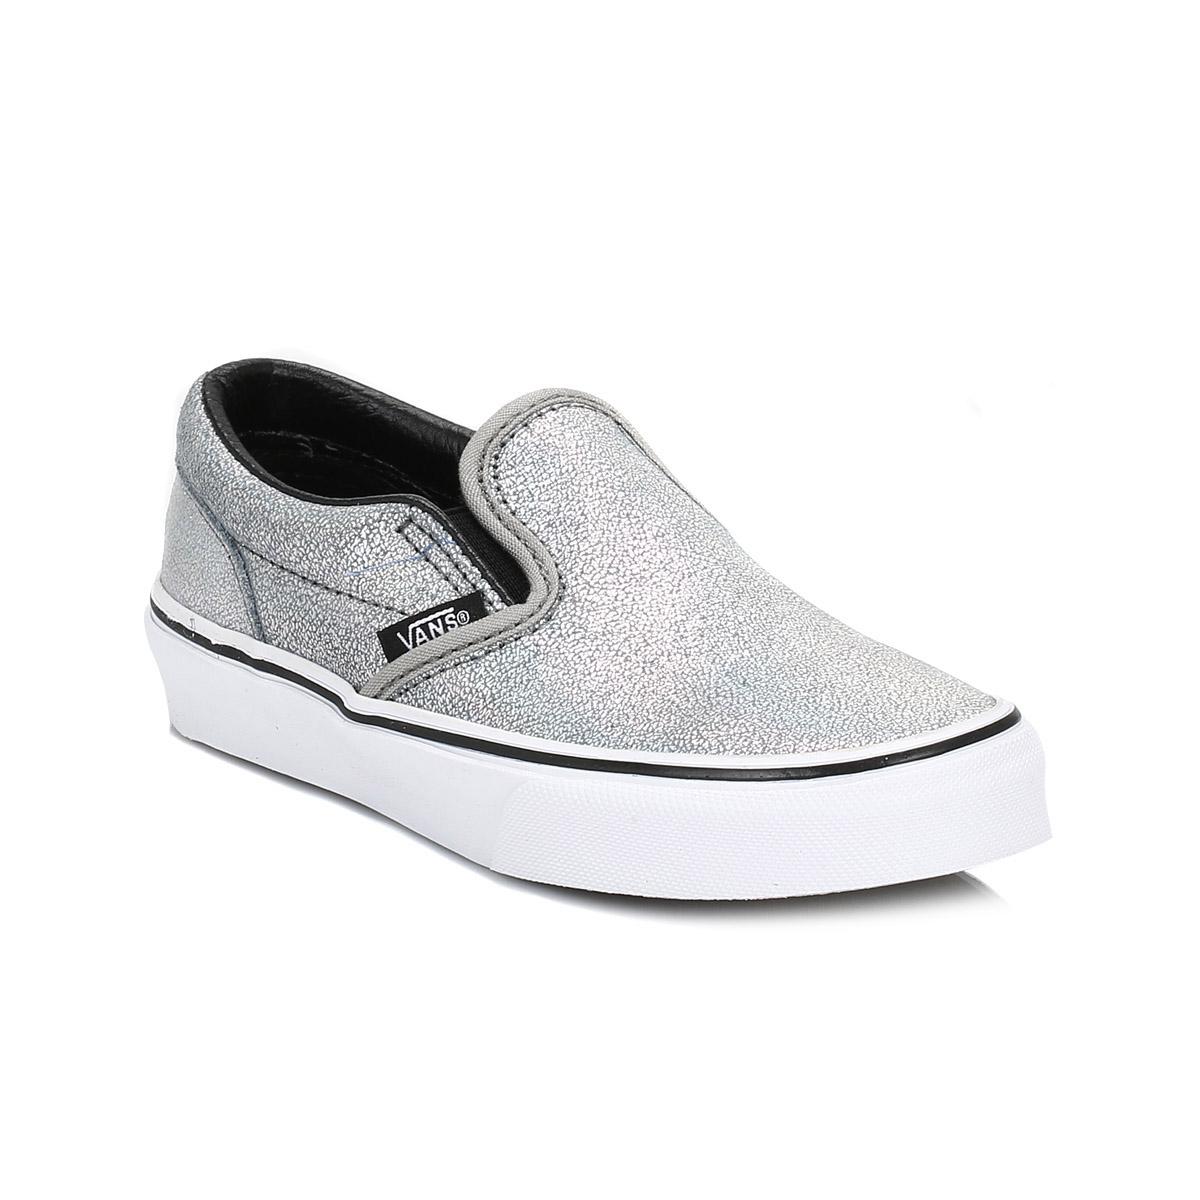 Vans Kids Girls Boys Trainers Iridescent Silver Slip